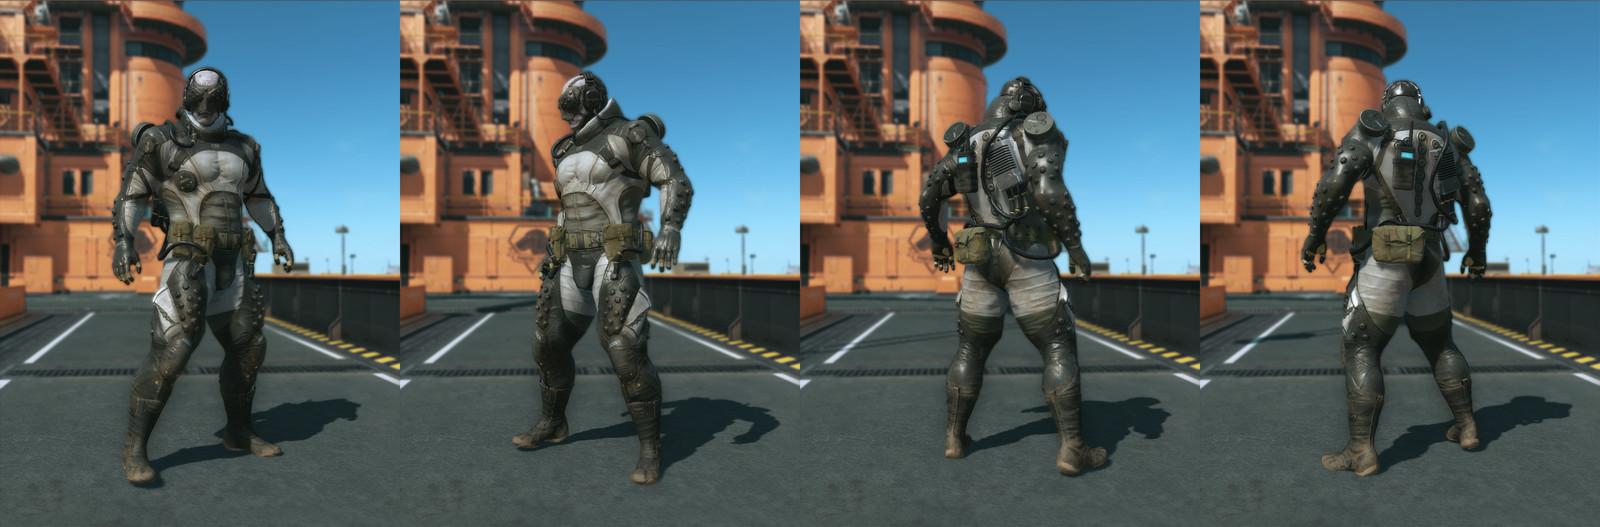 Metal Gear Solid V: The Phantom Pain - misc work